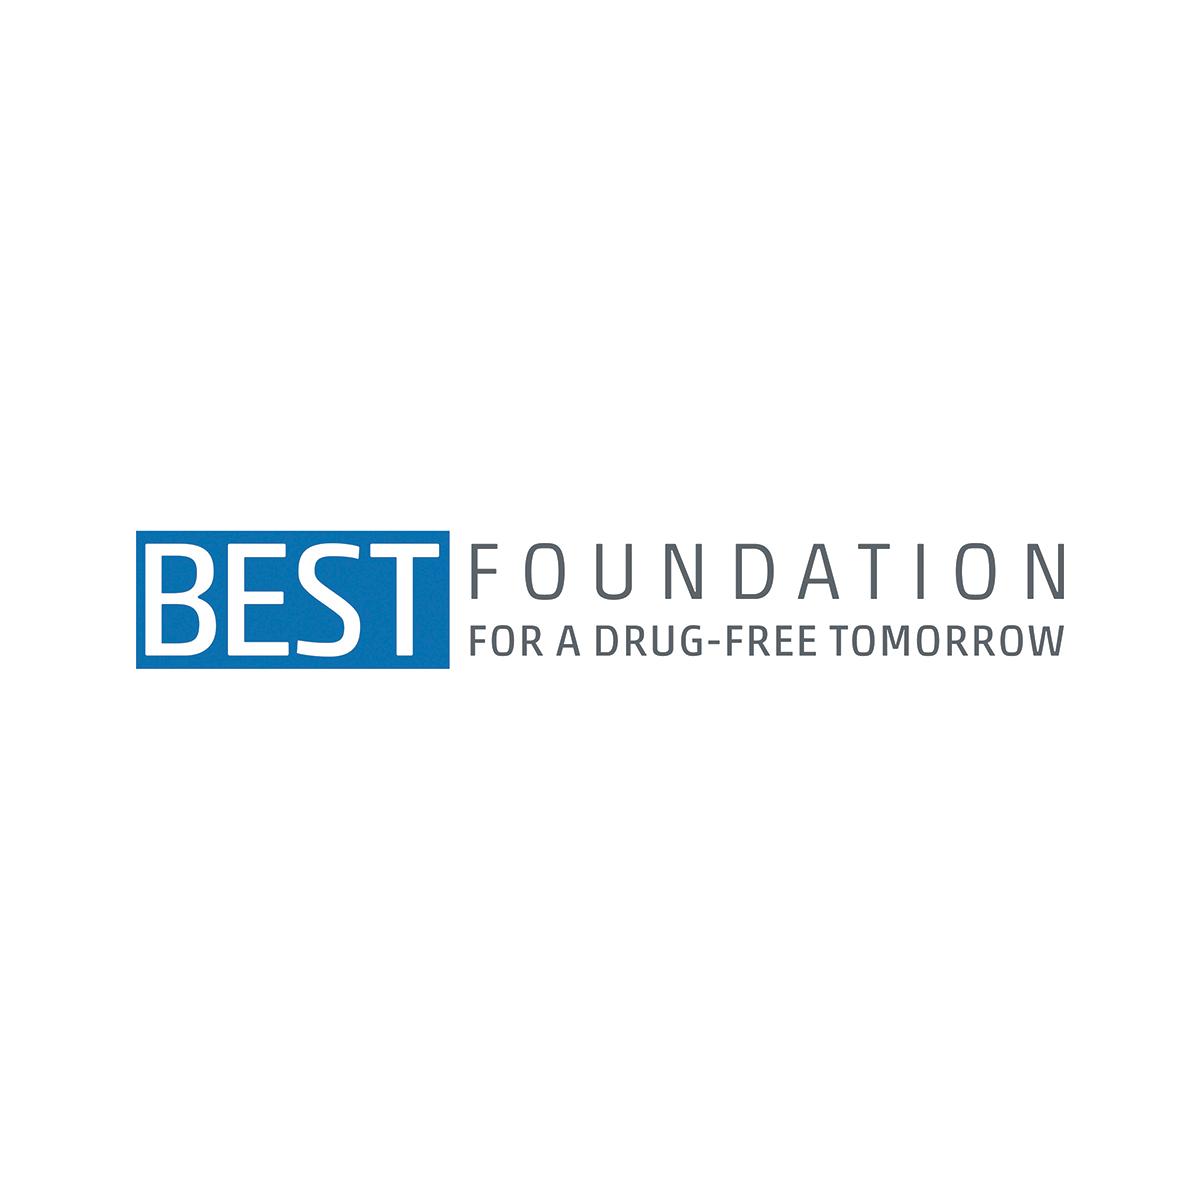 BEST Foundation